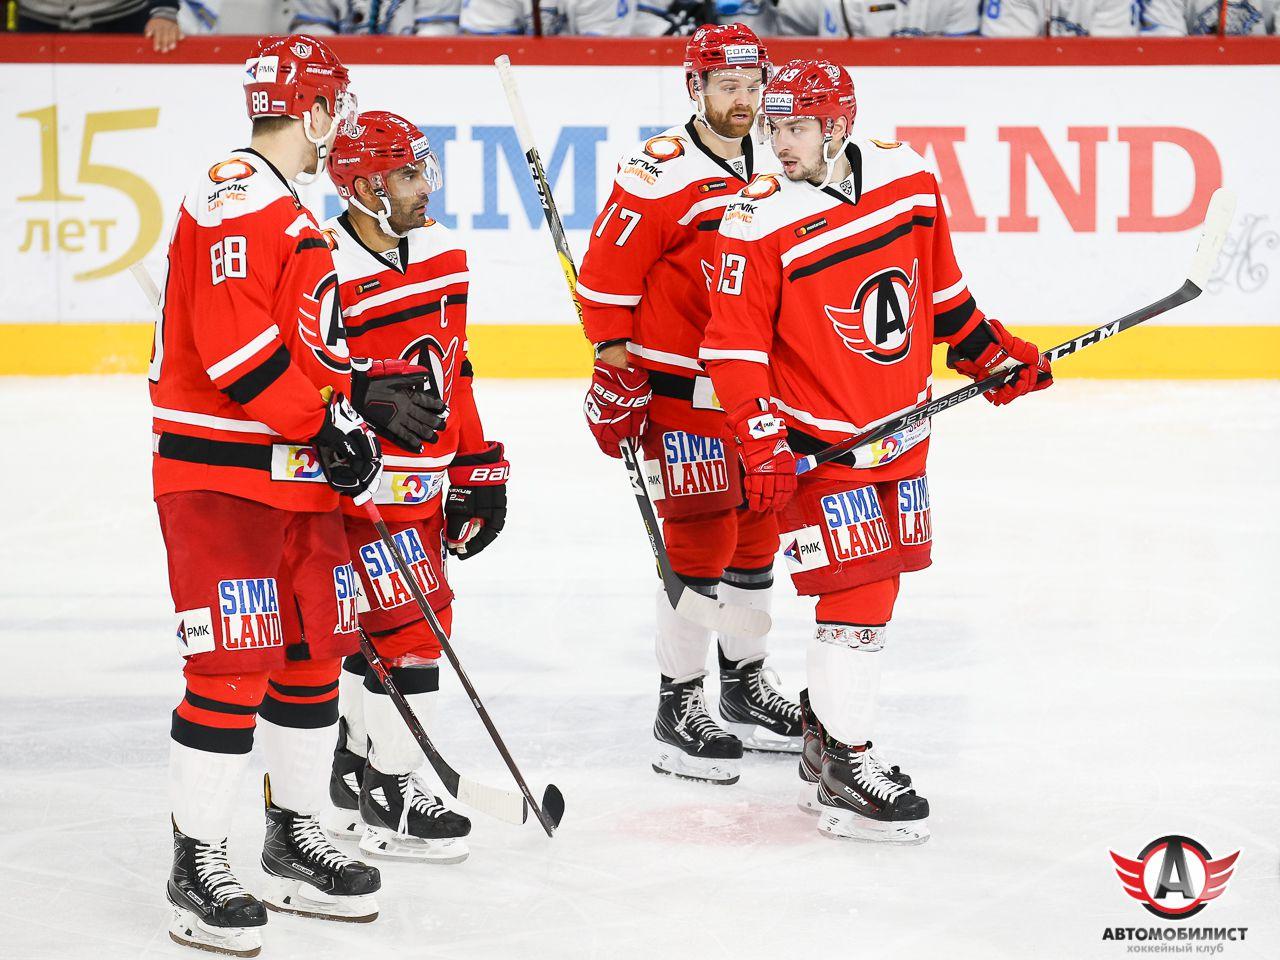 Прогноз на КХЛ: Металлург Магнитогорск – Автомобилист – 10 октября 2018 года